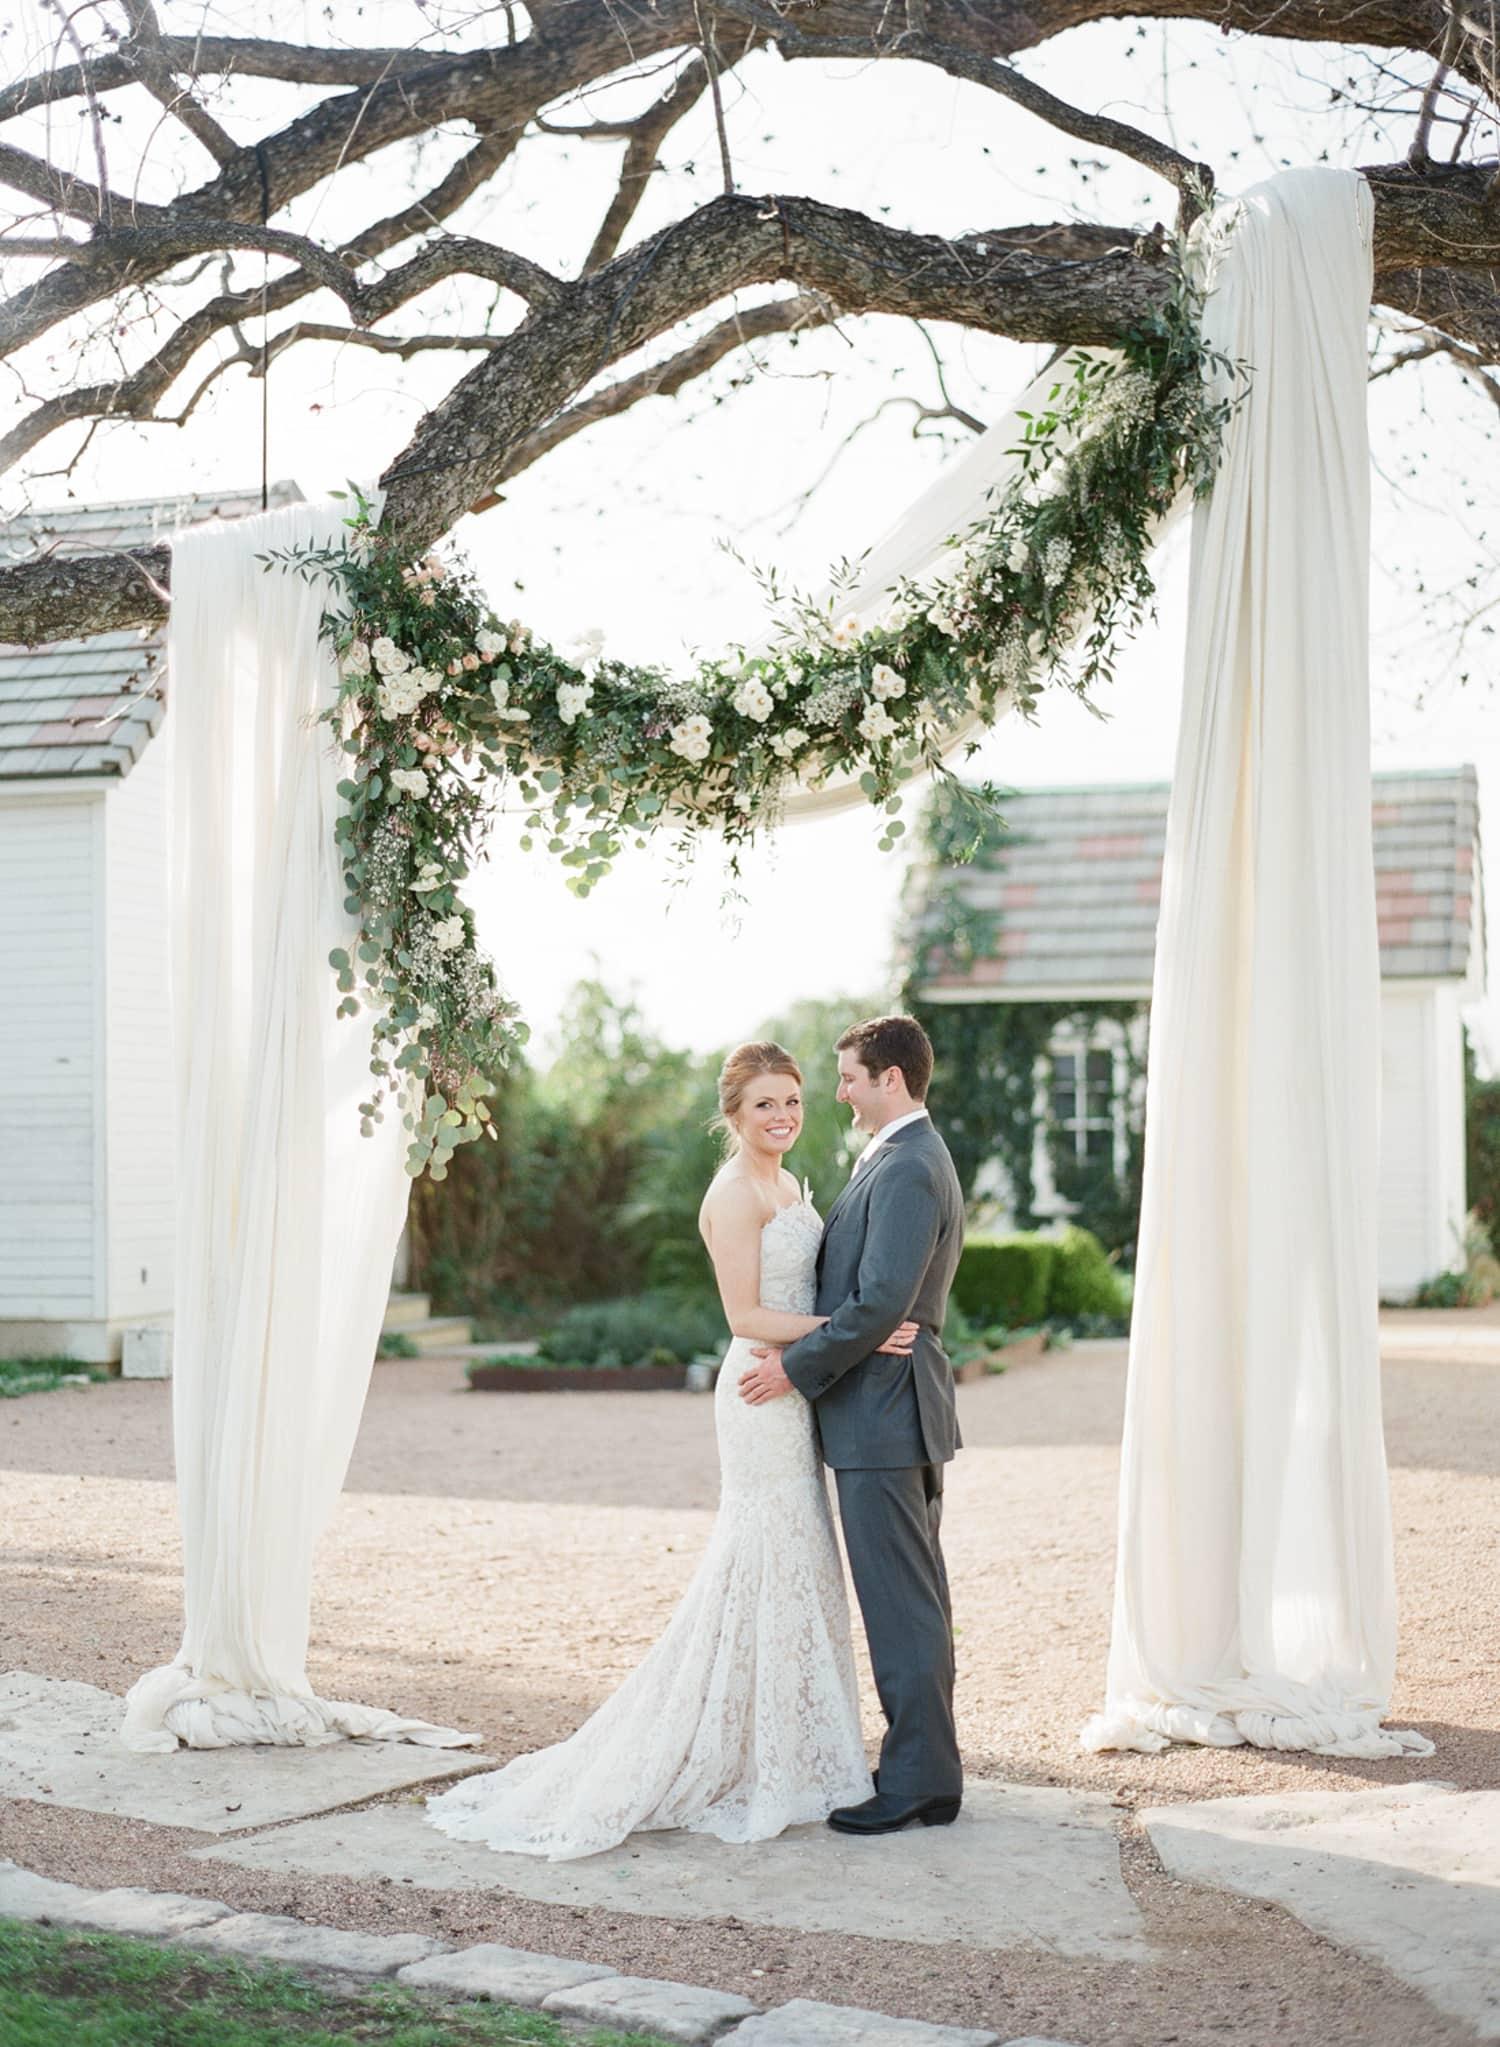 barr-mansion-wedding-43.jpg